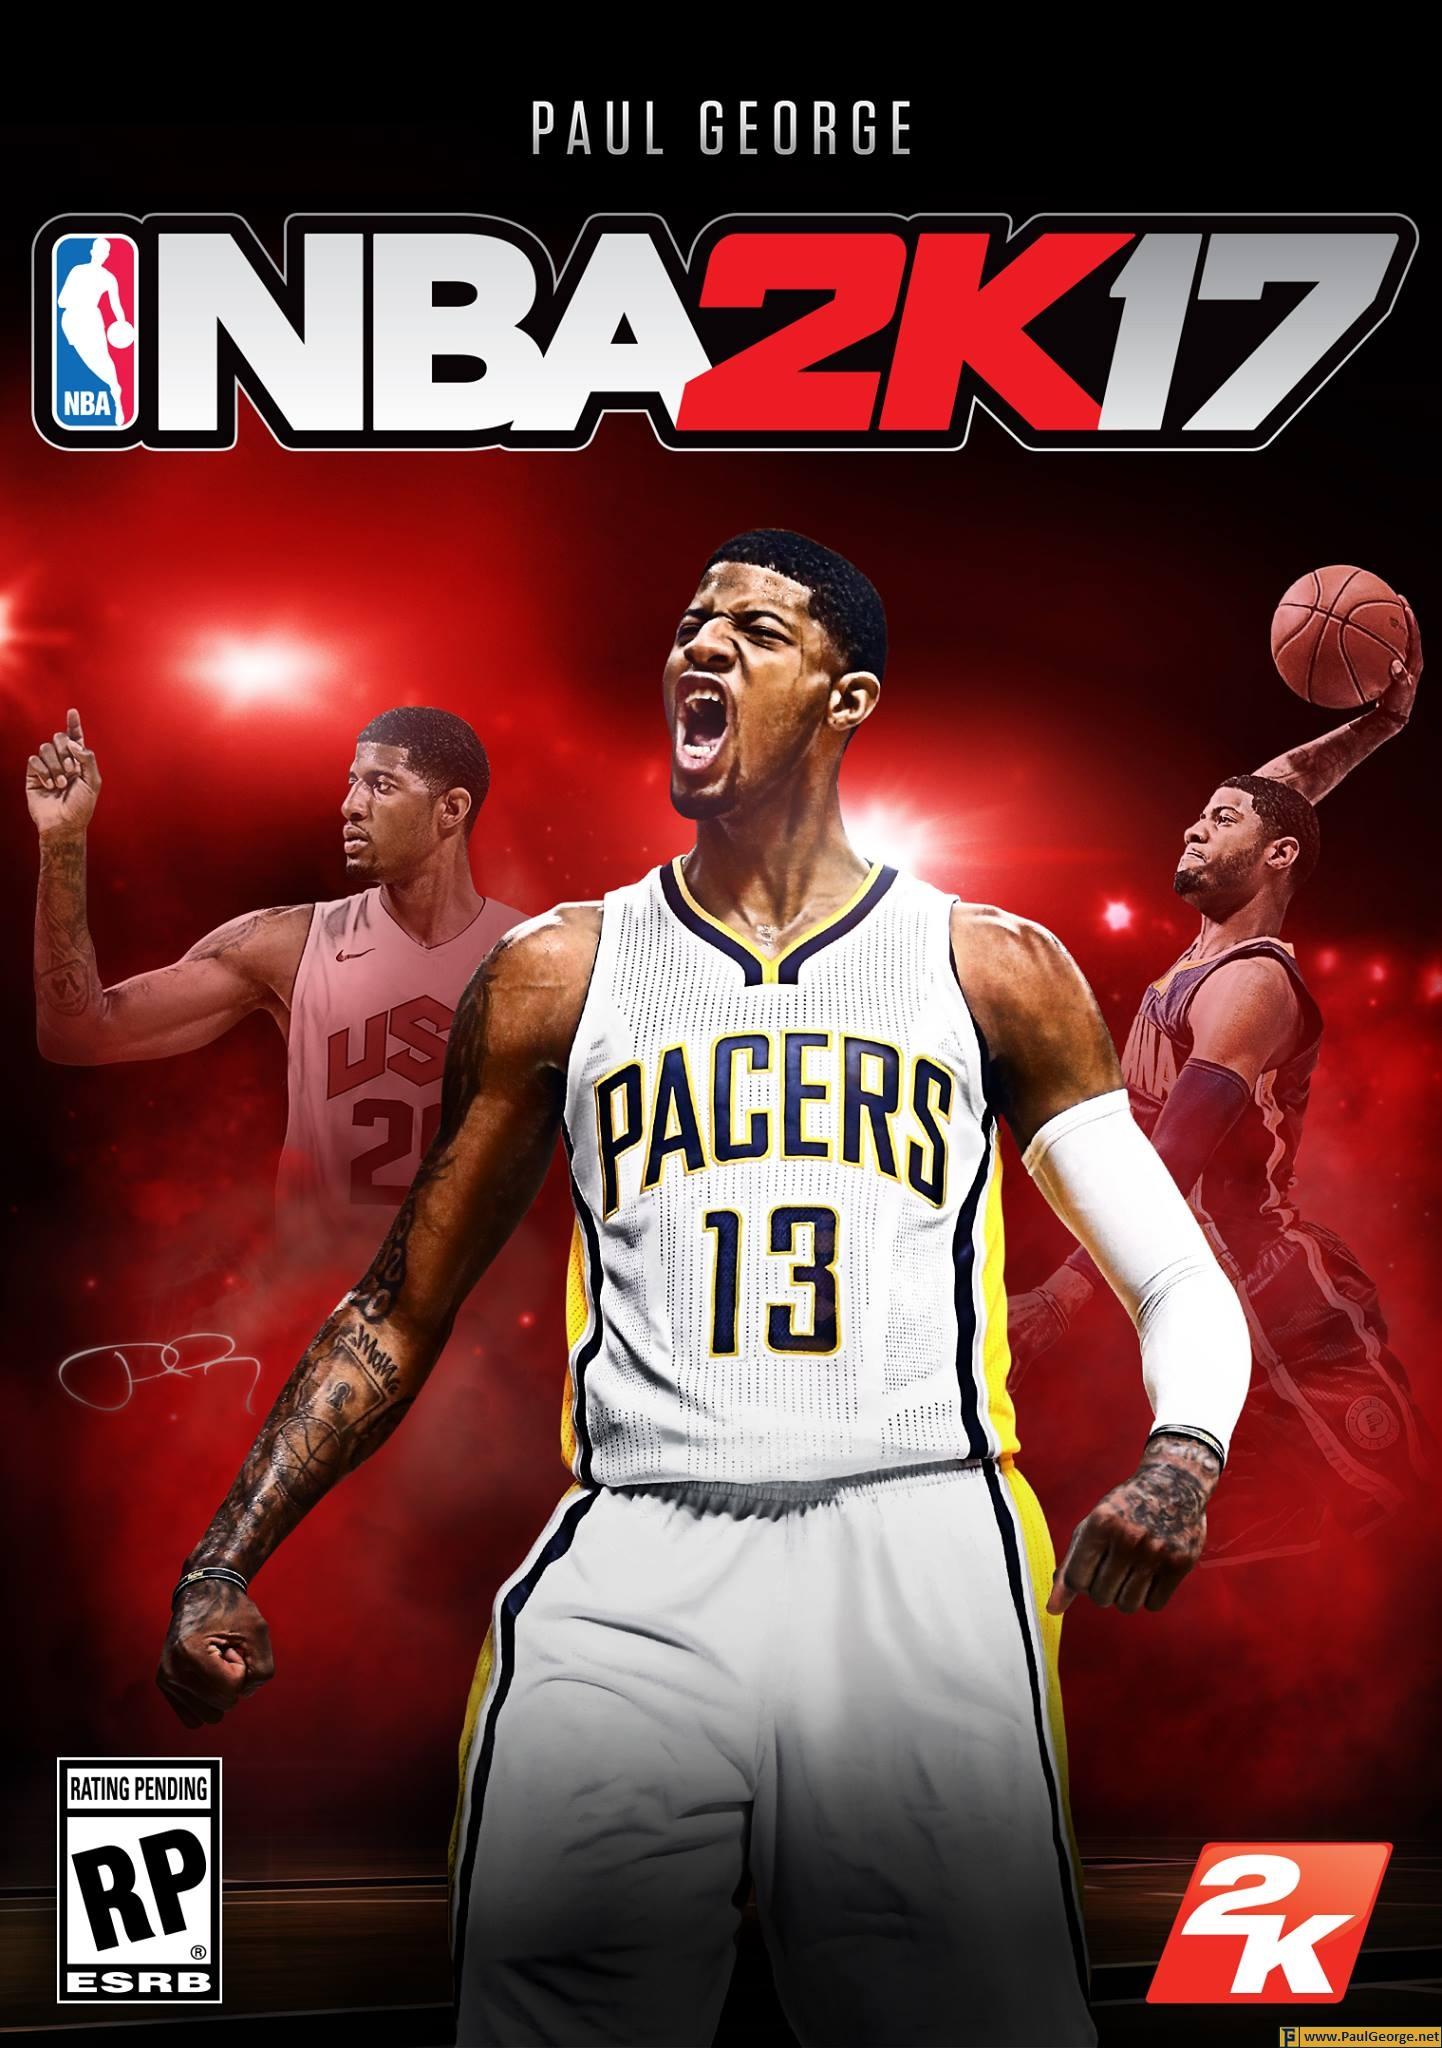 Paul George Named NBA 2K17 Cover Athlete